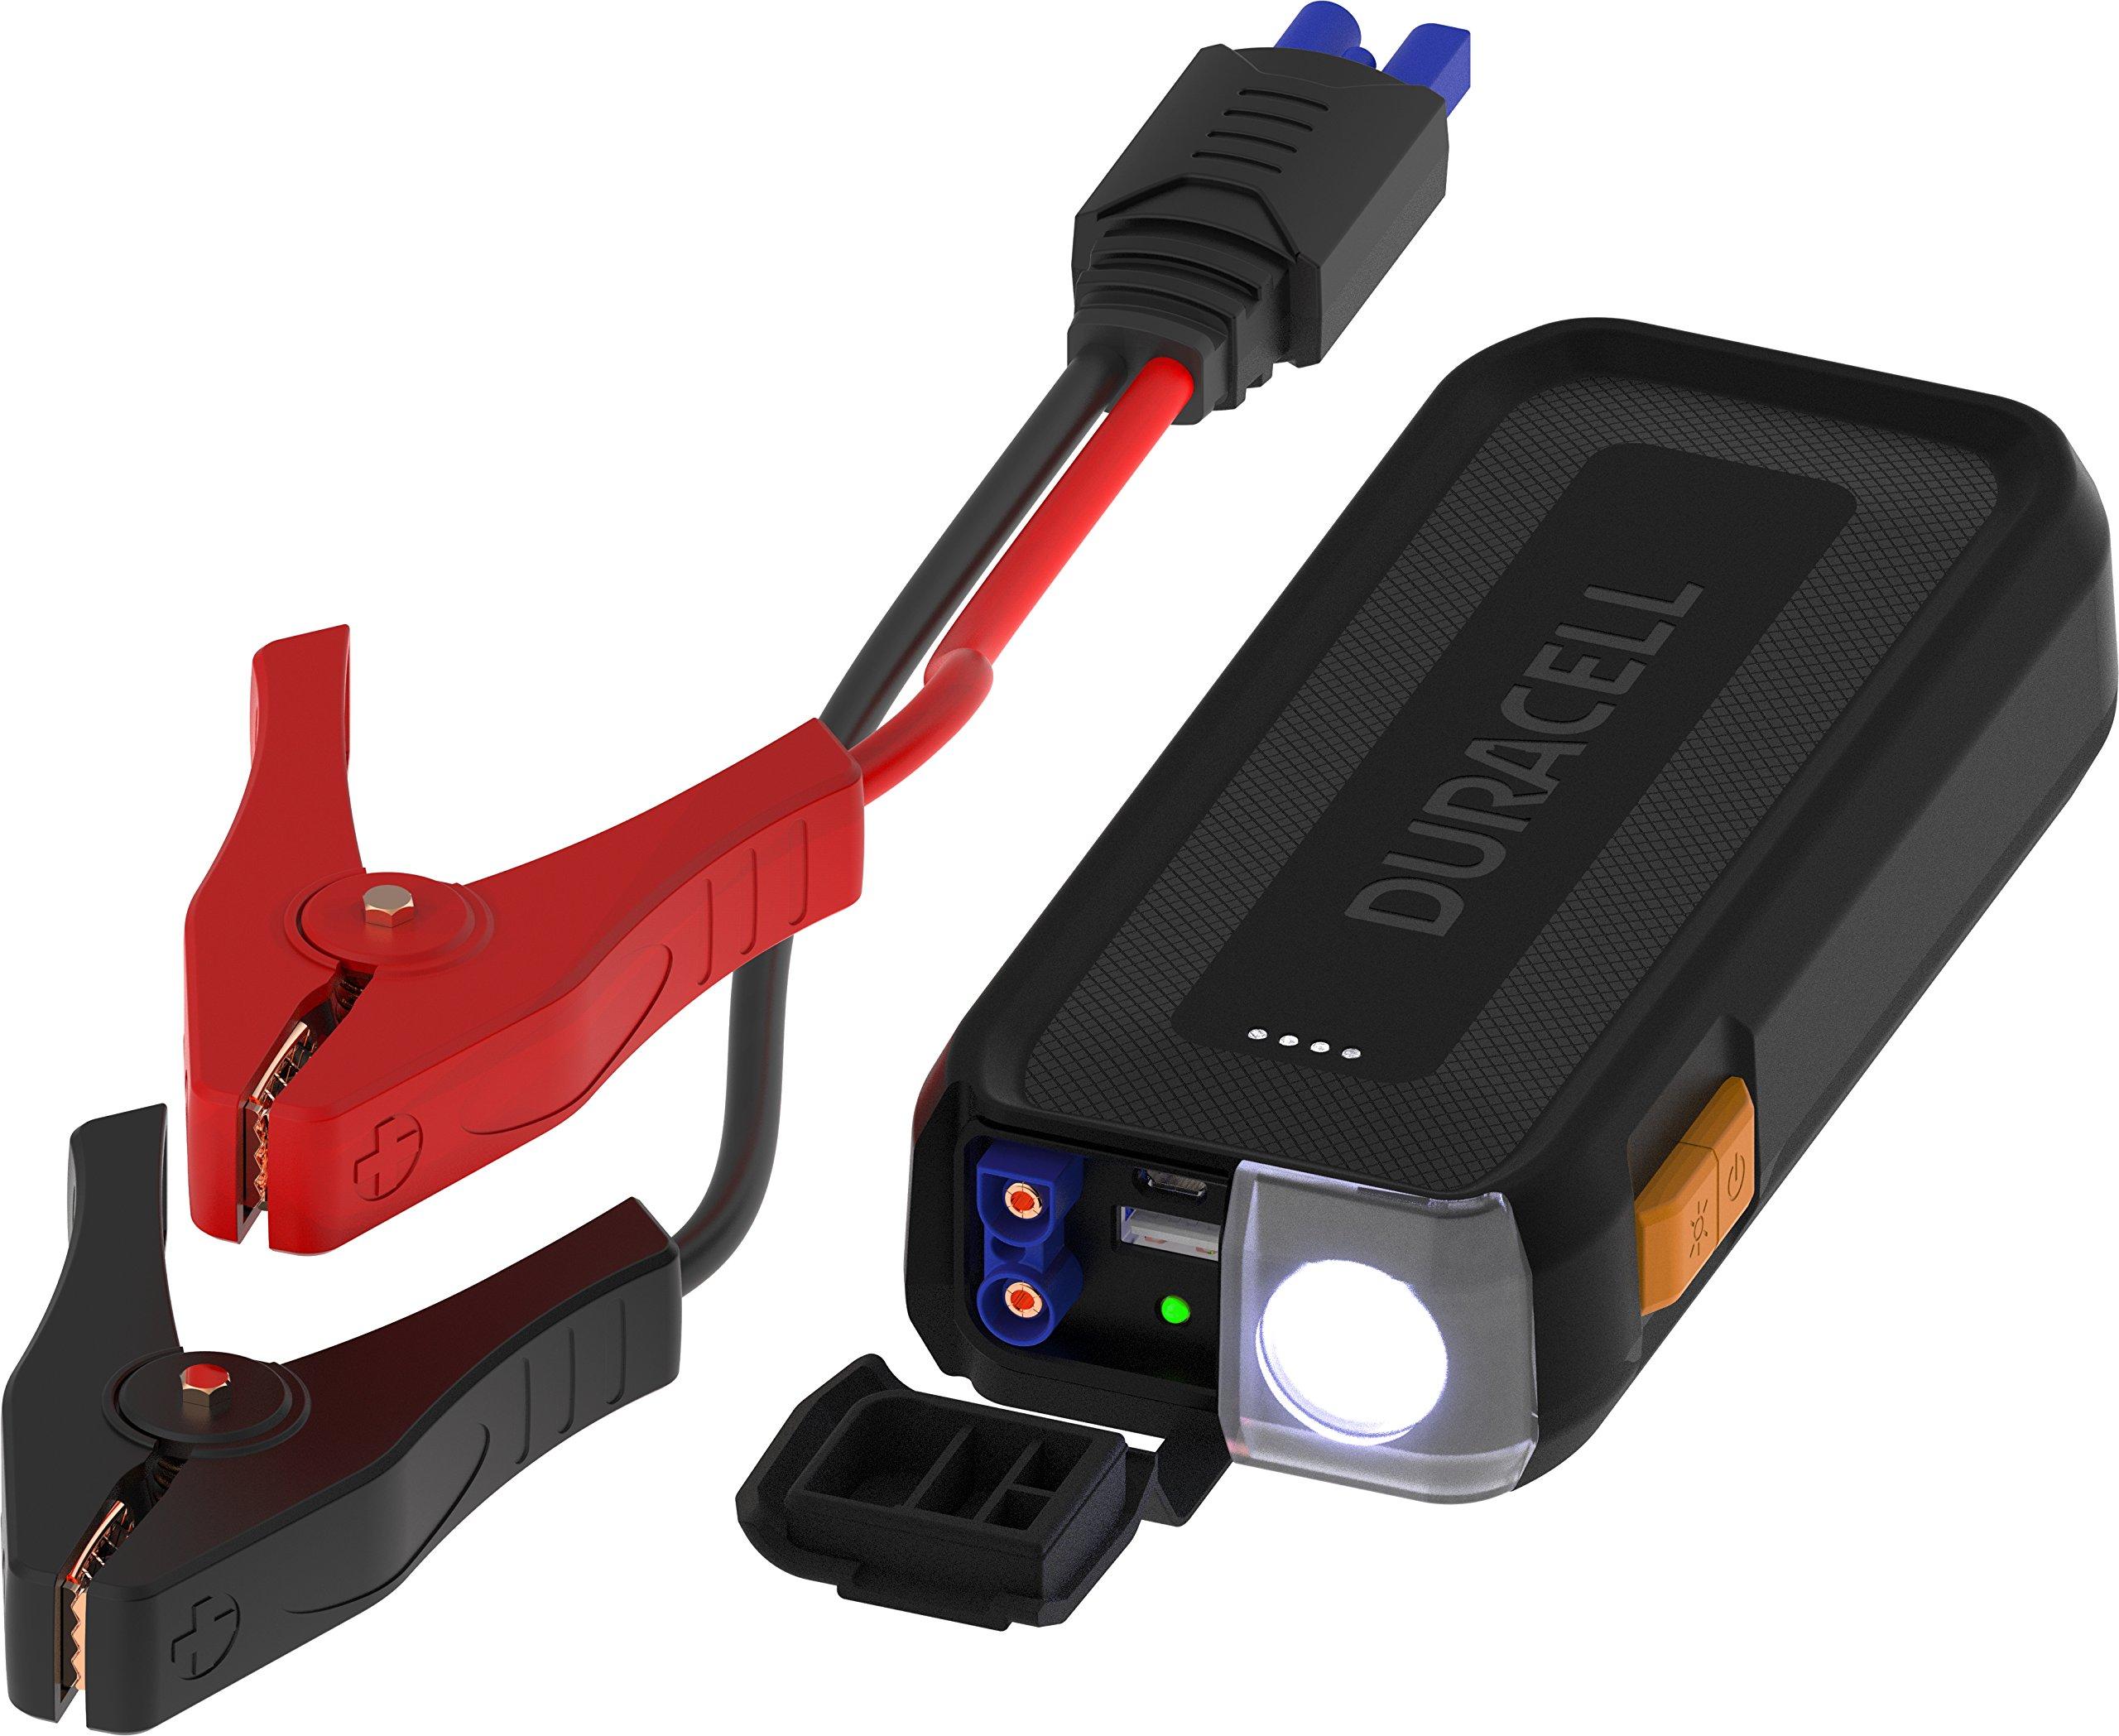 Duracell DRLJS20 Lithium-Ion Emergency Jumpstarter, 1100 Peak Amps